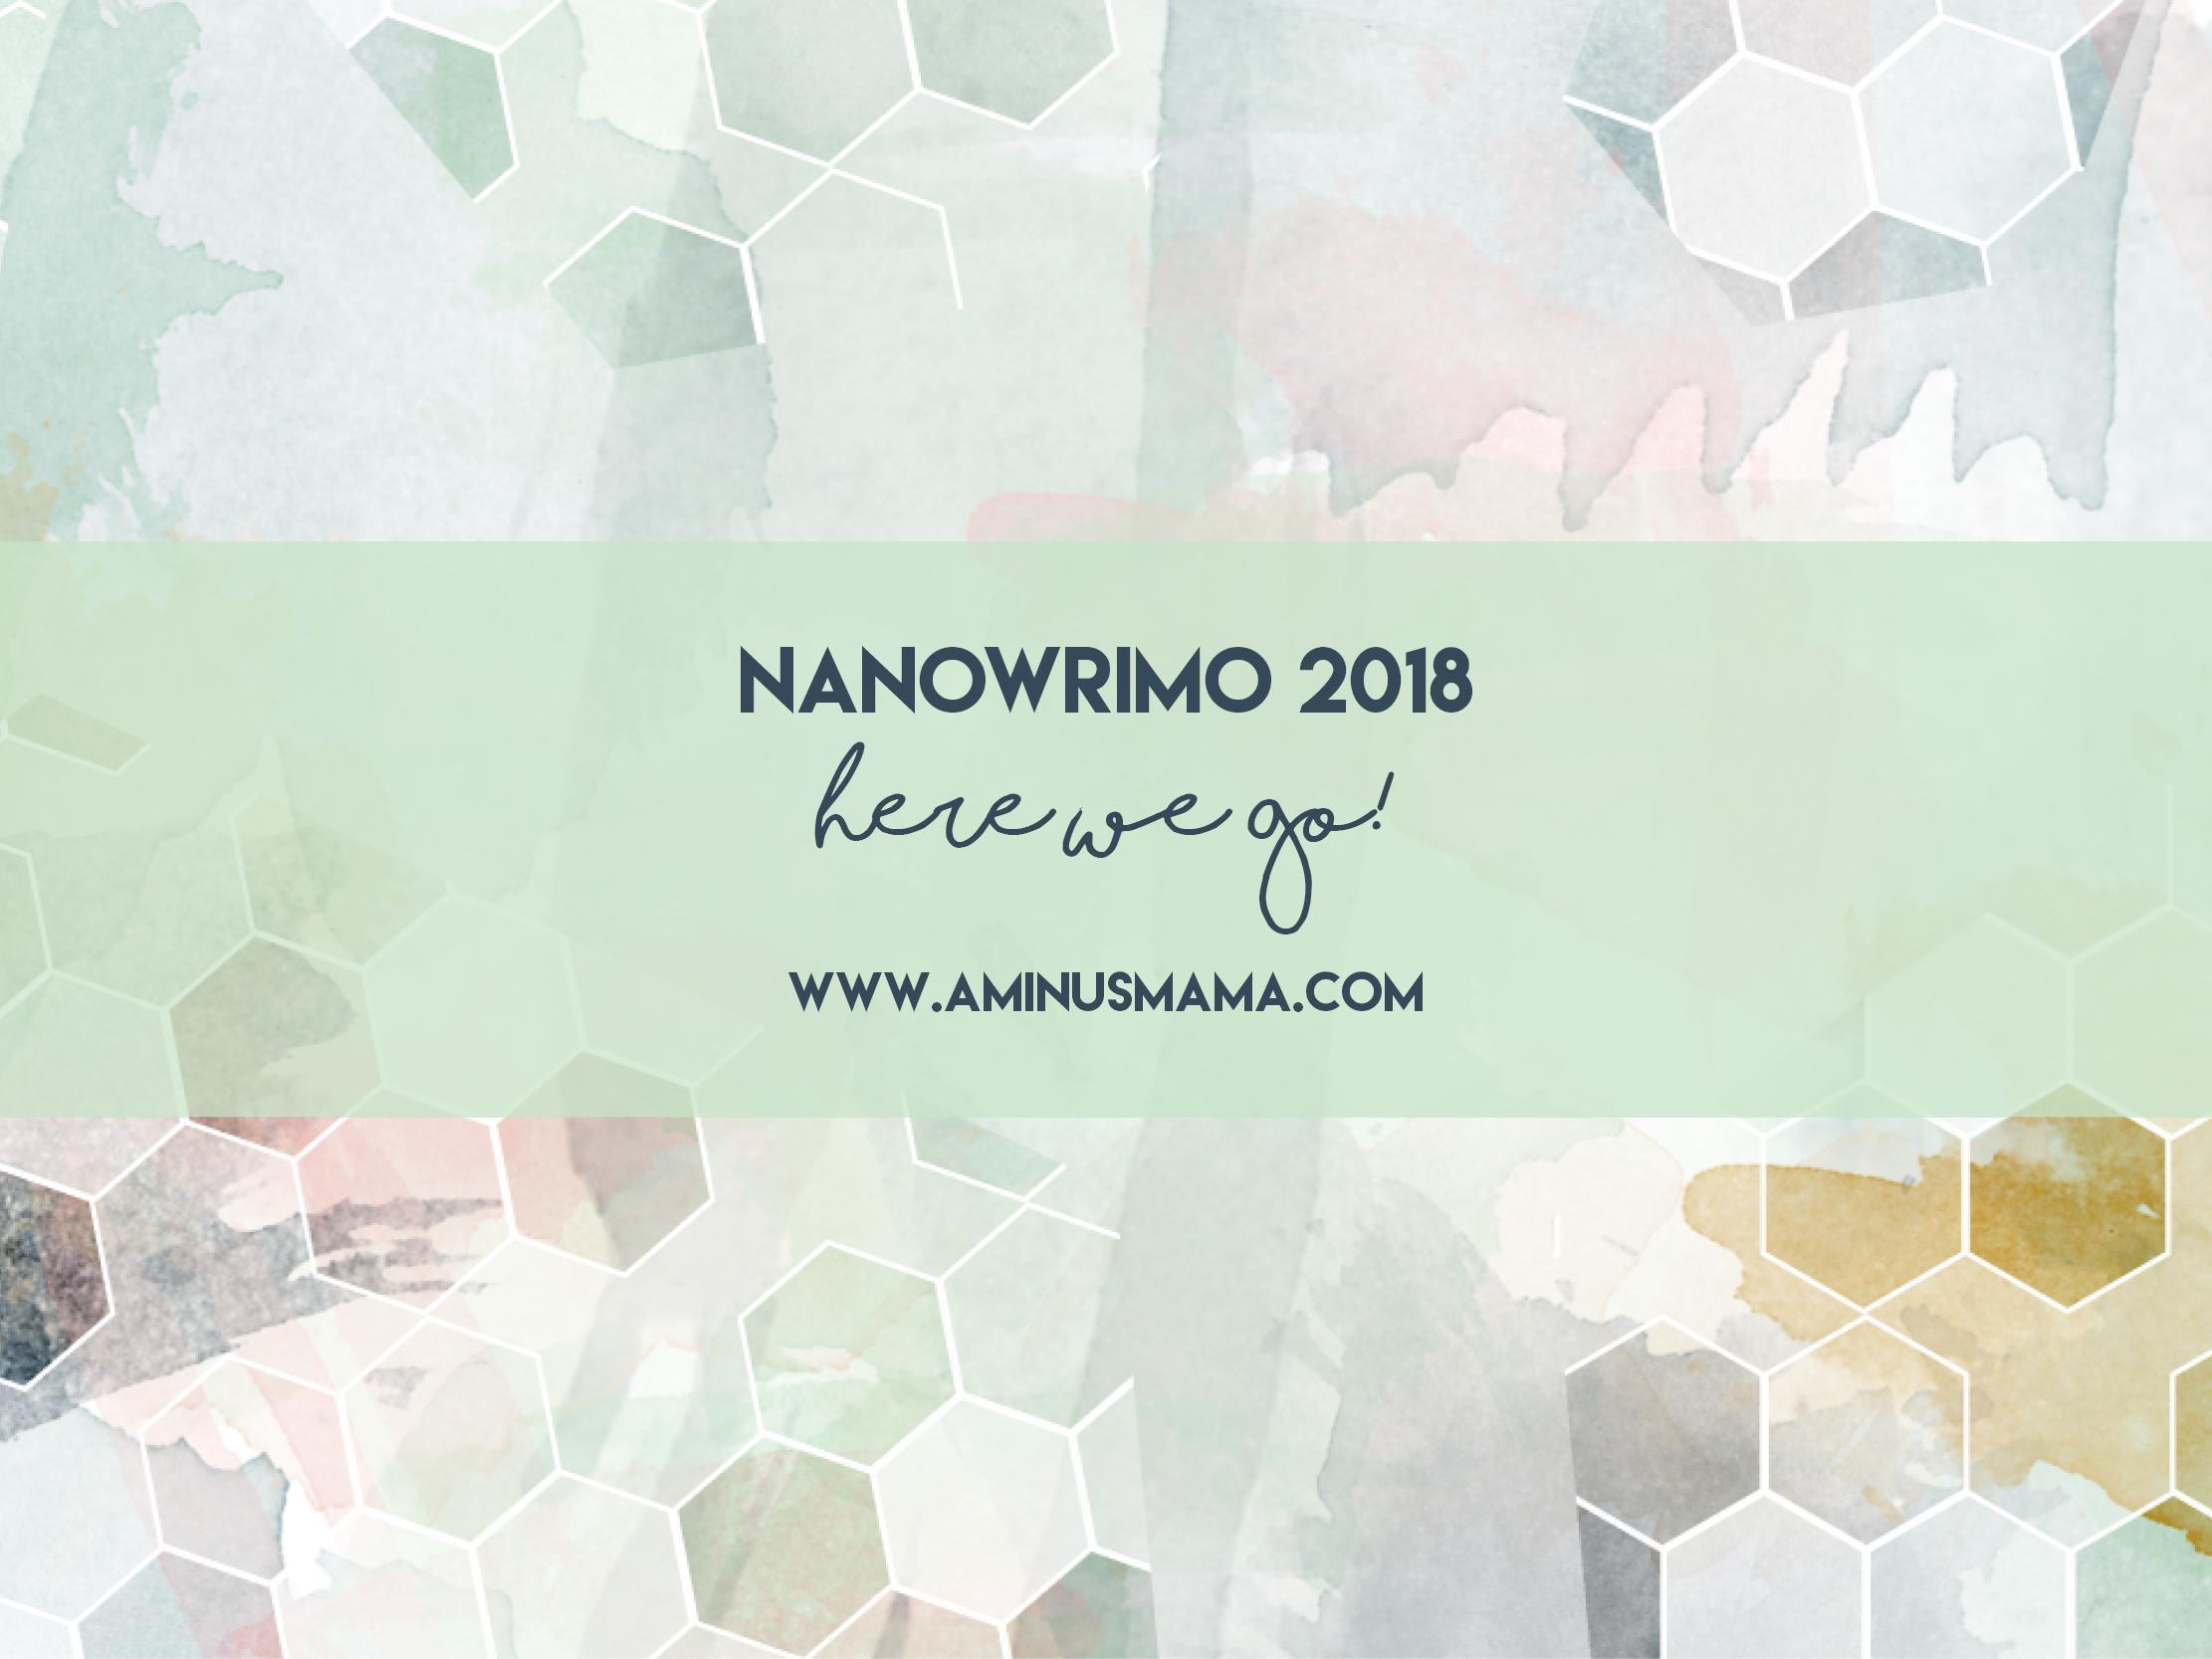 NaNoWriMo Kickoff 2018